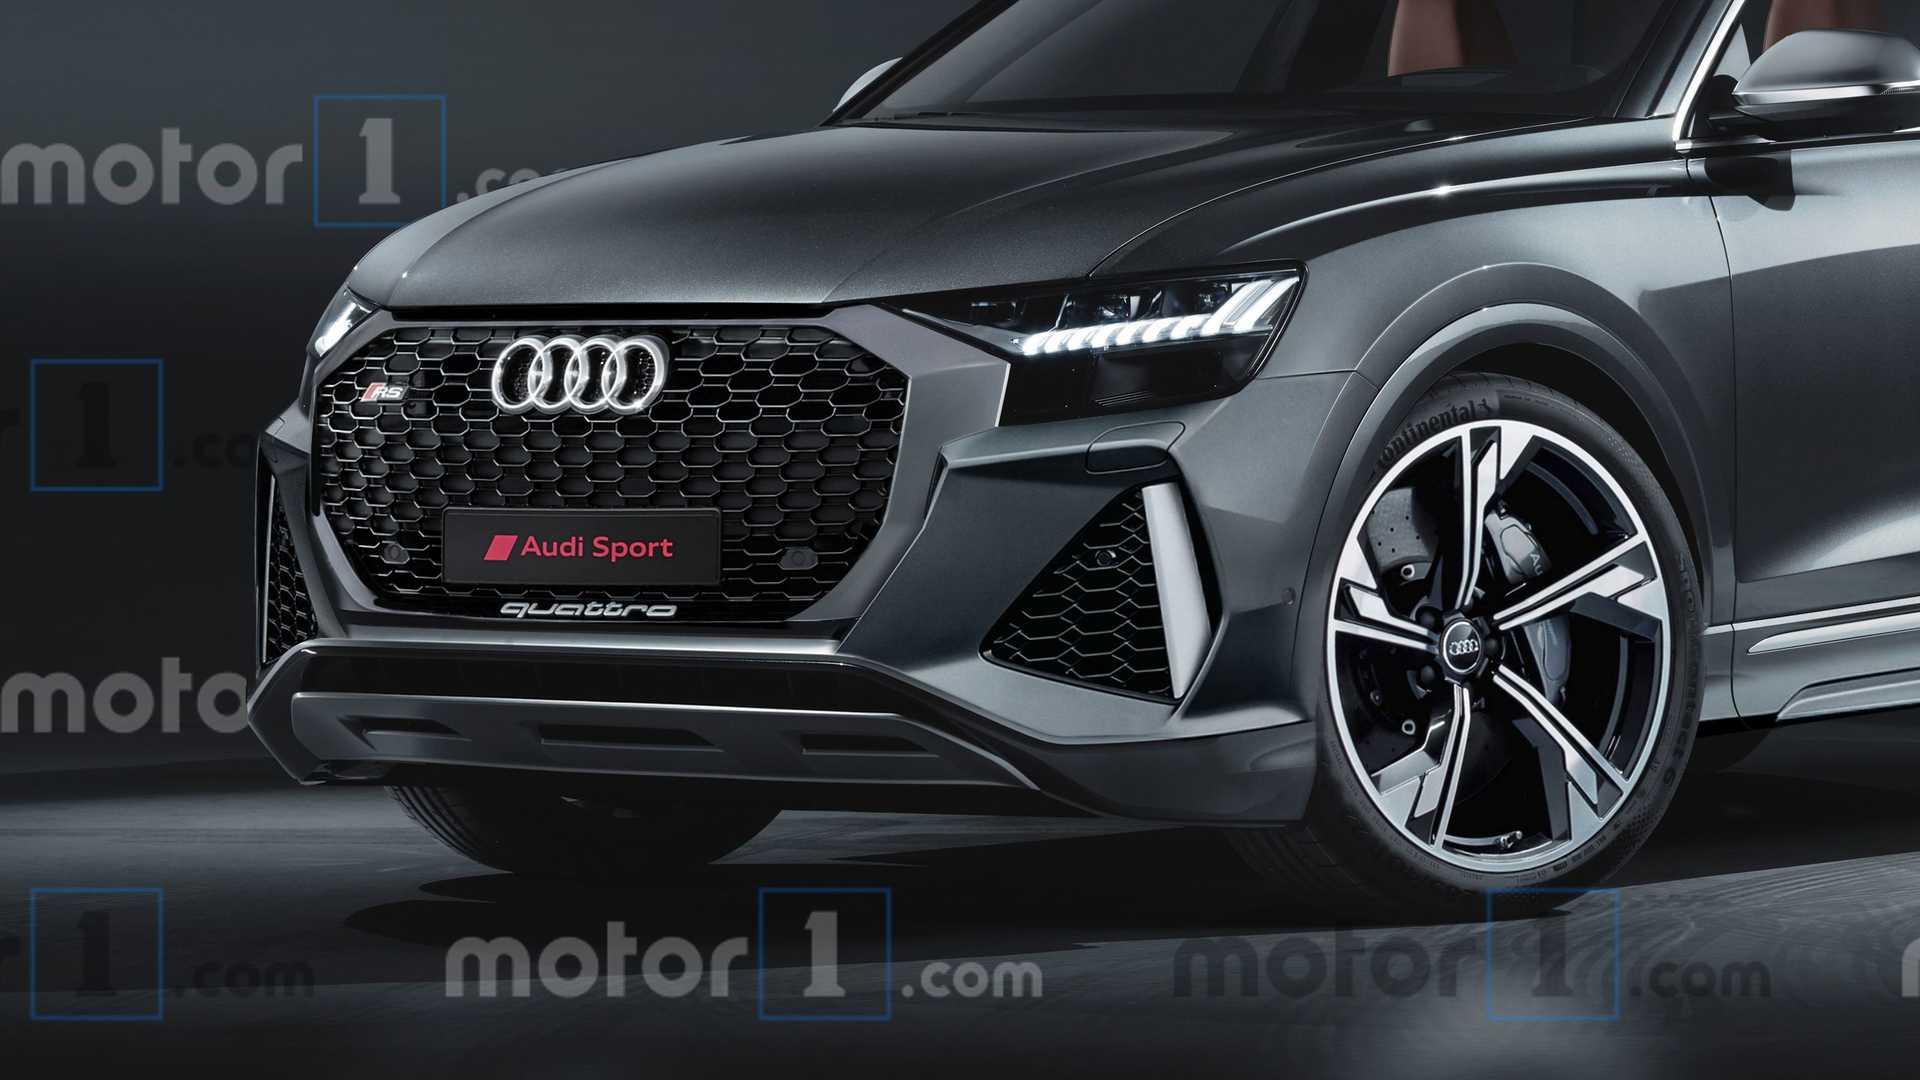 2020 Audi RS Q8 rendering Motor1com Photos 1920x1080